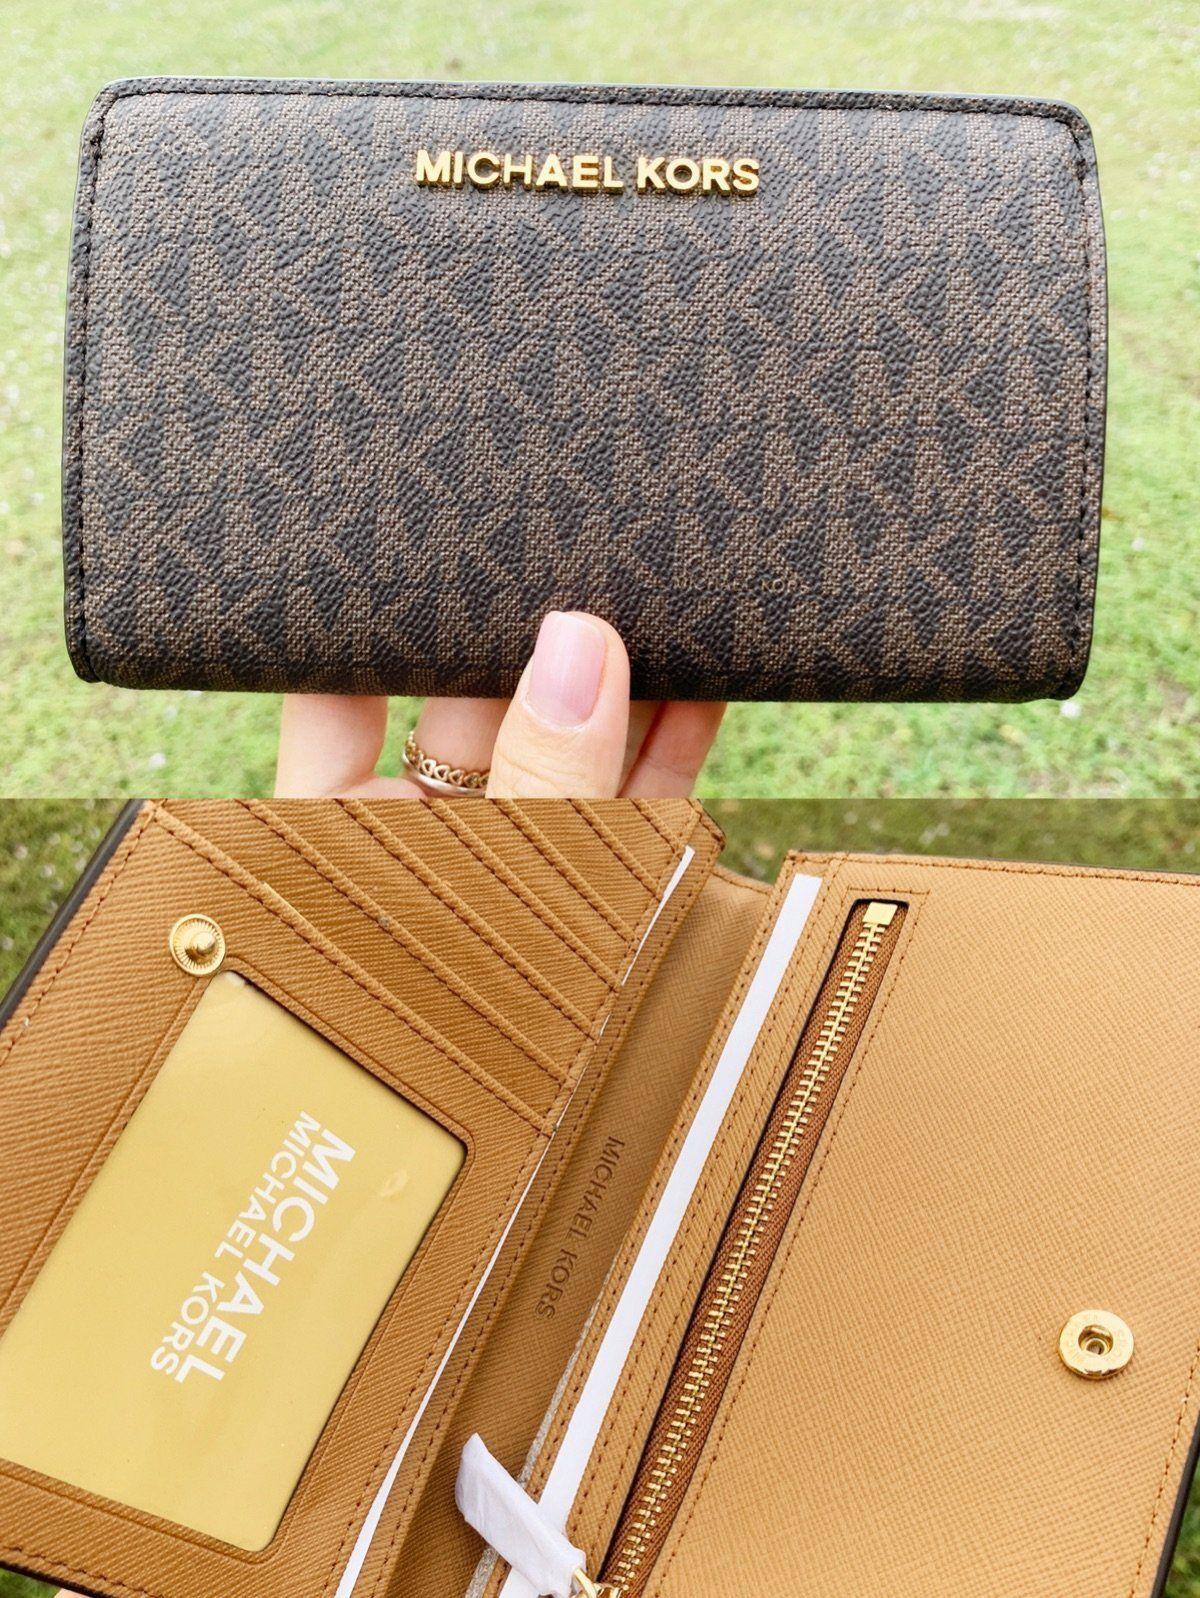 Pin on Handbags and Purses